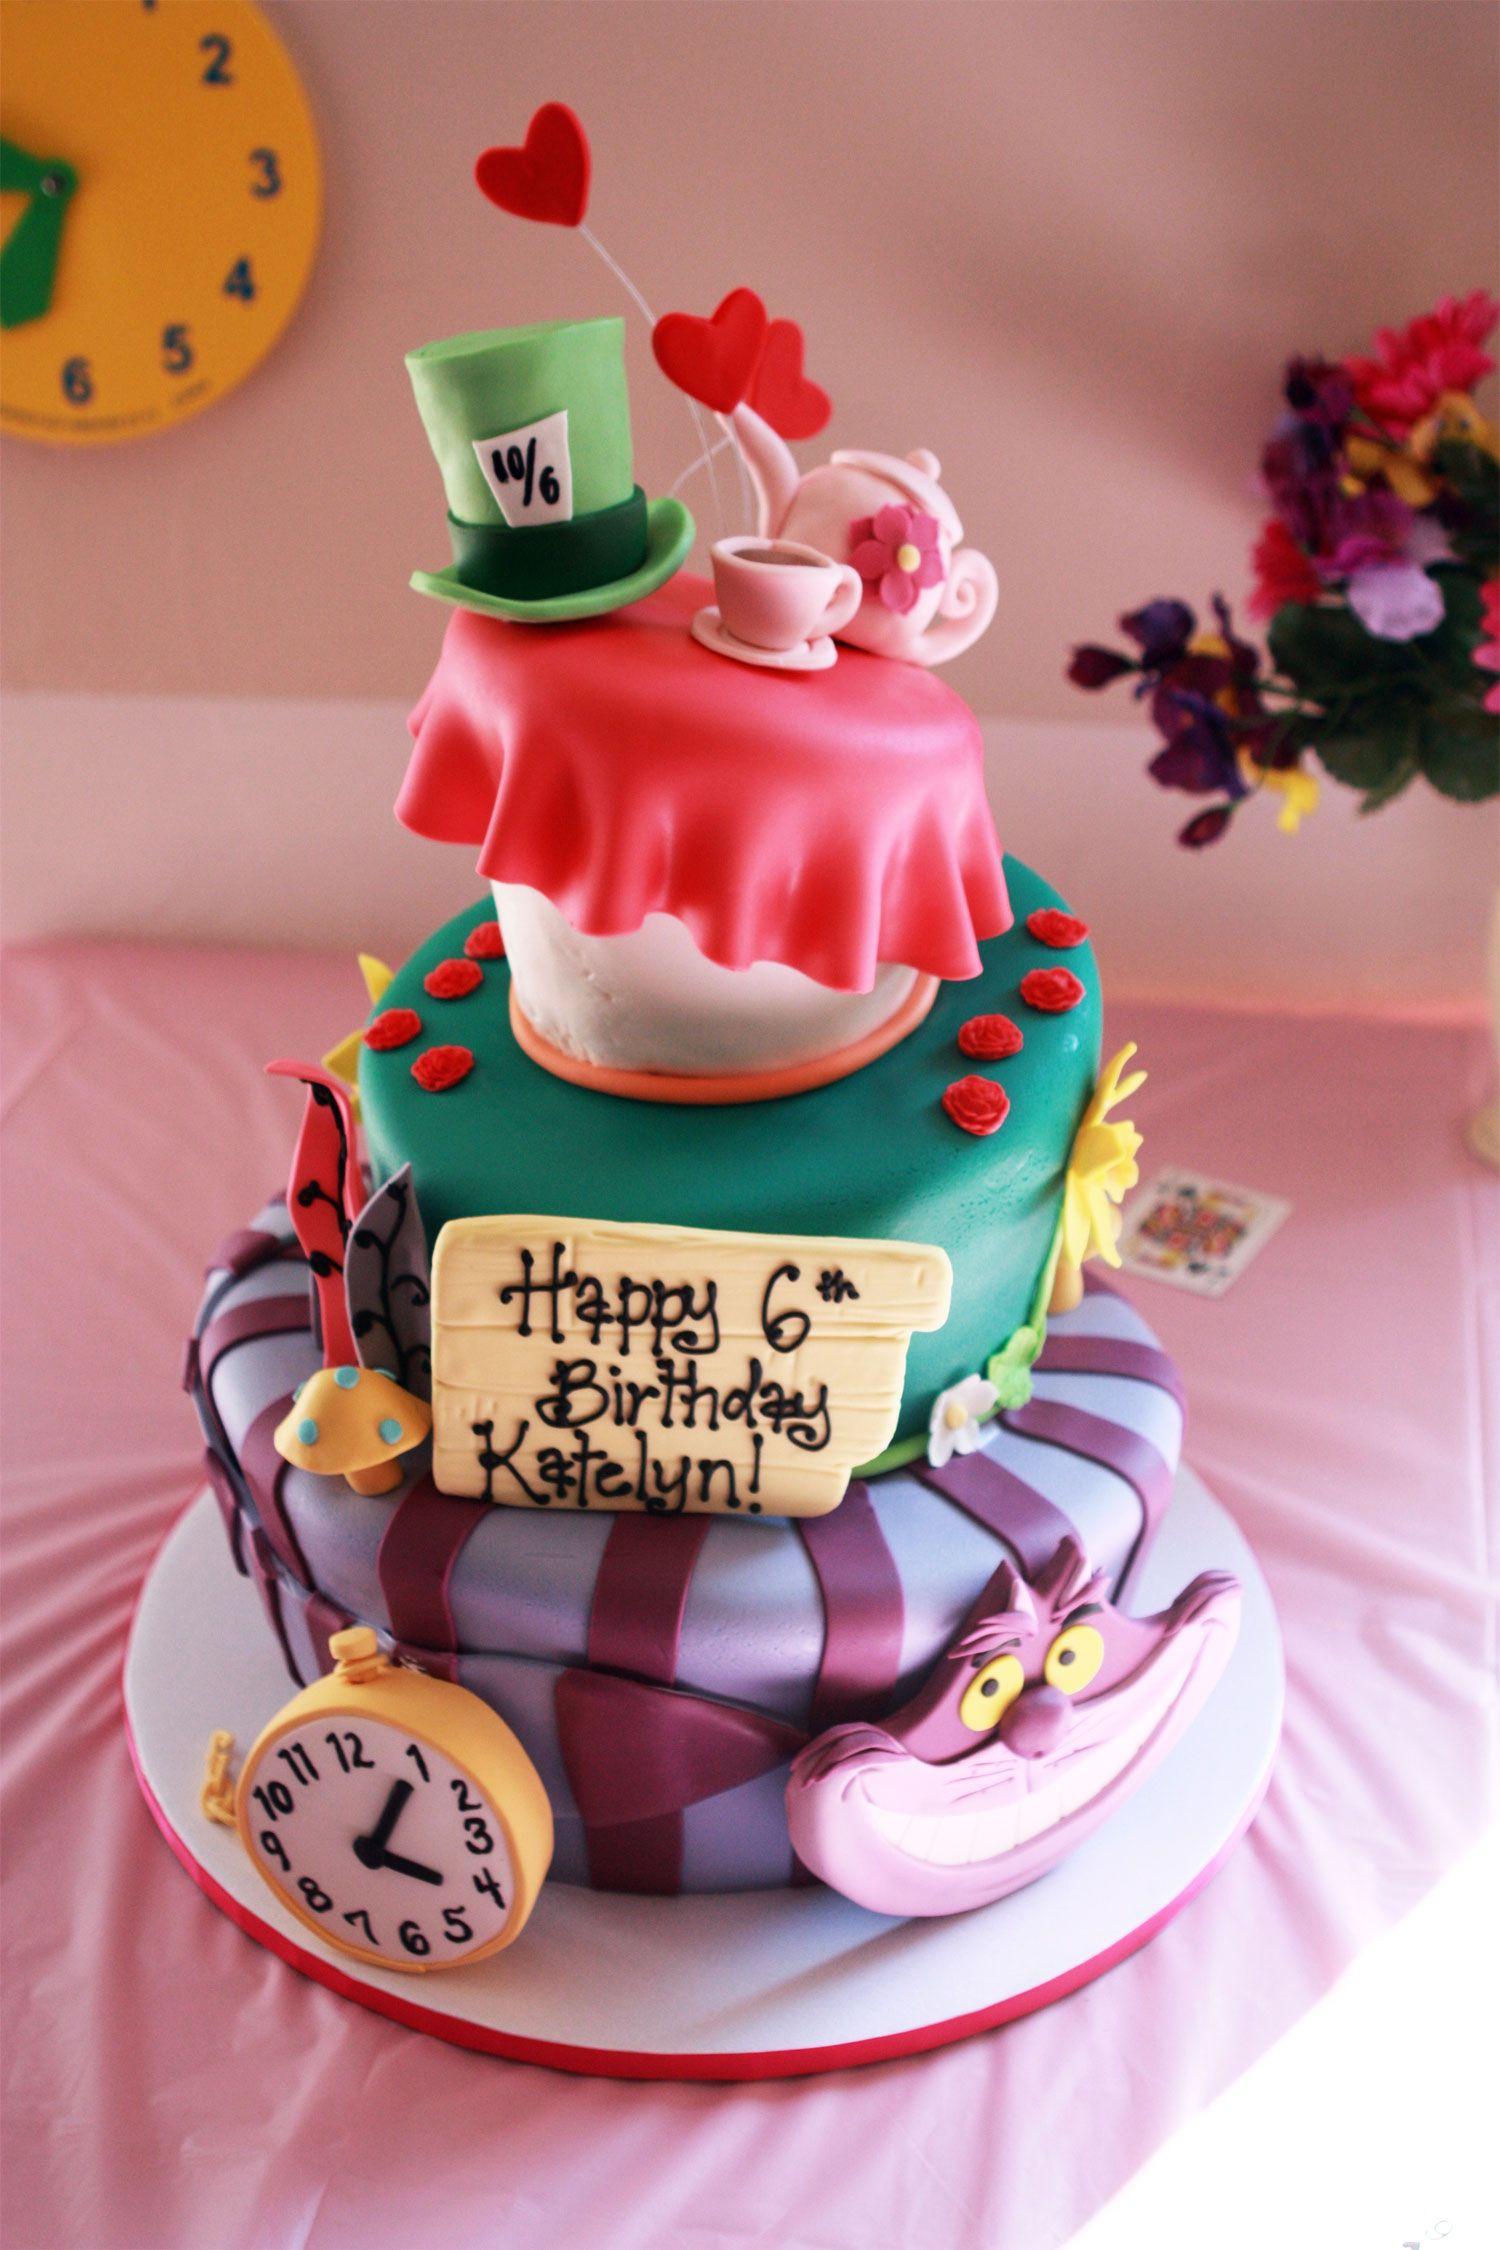 Pin By Kelly Tormey On Cakes Sweet Treats Pinterest